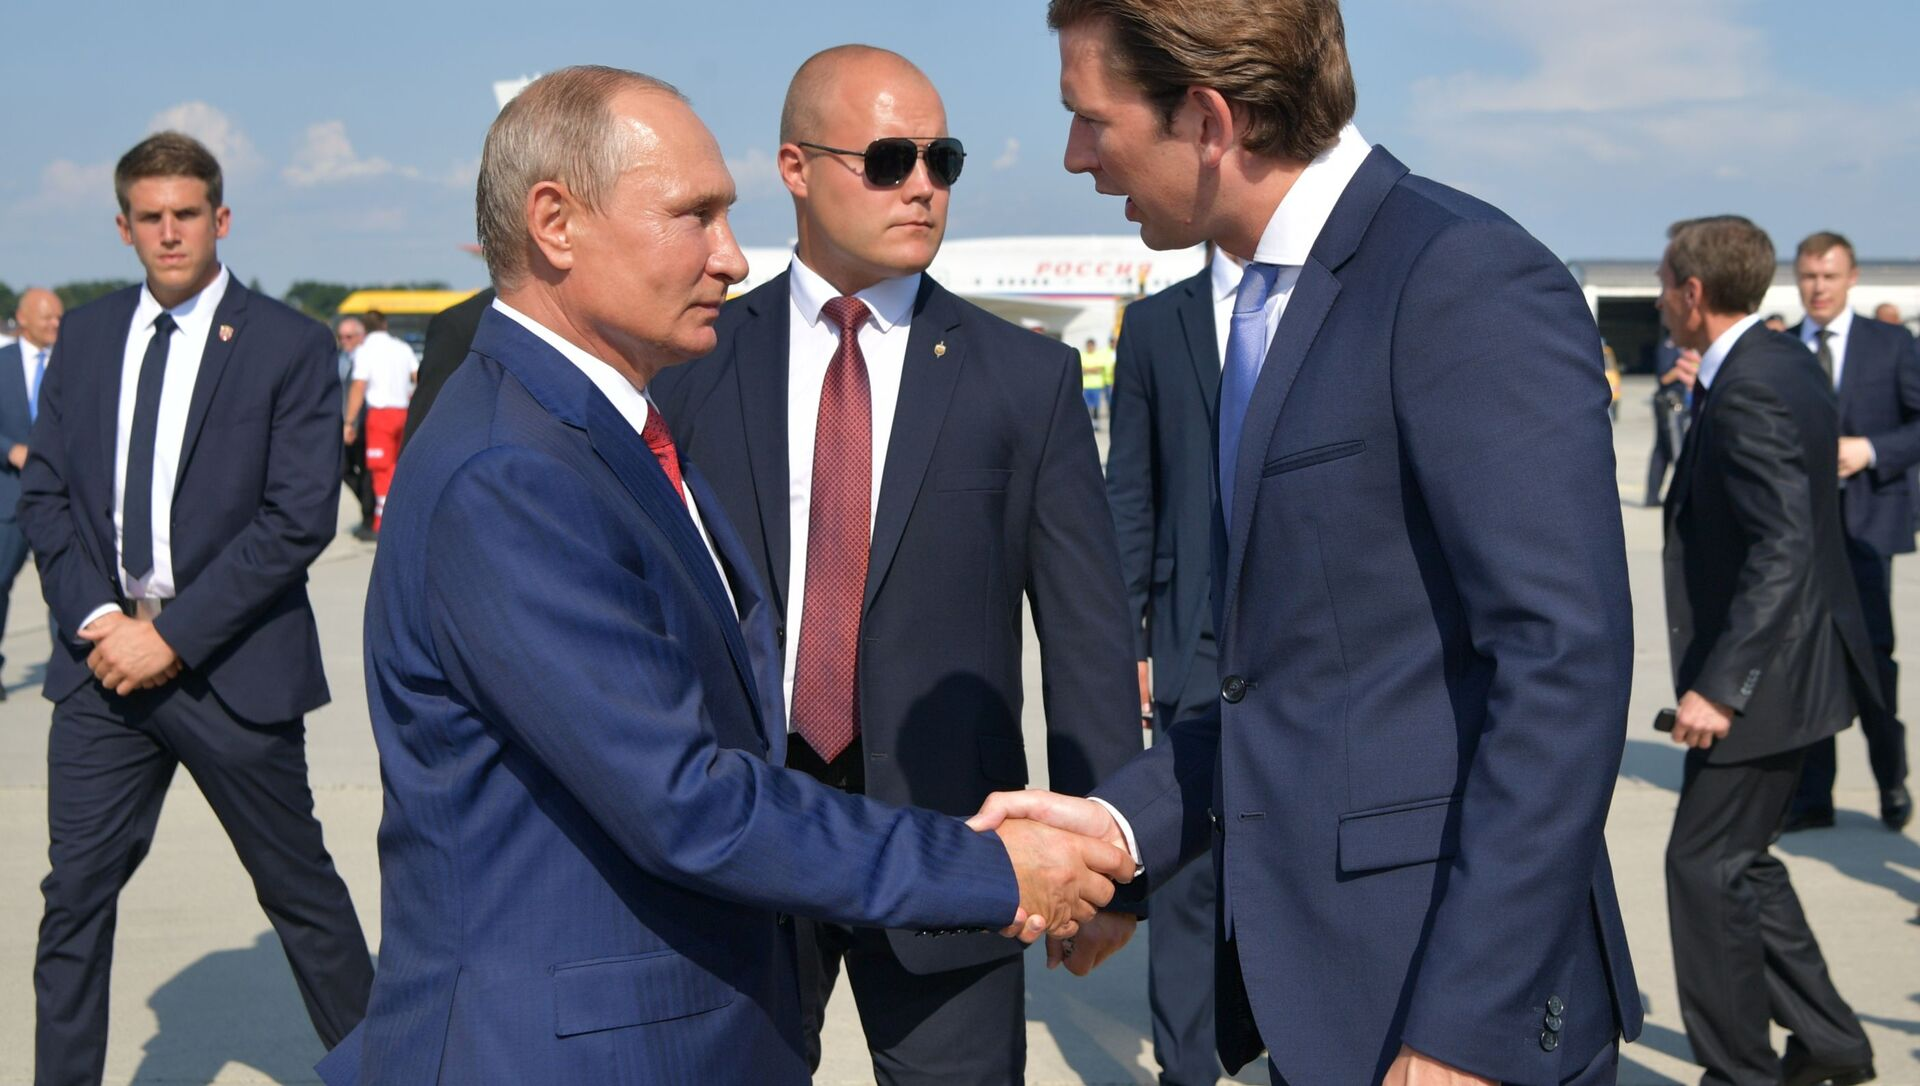 Ruský prezident Vladimir Putin a rakouský premiér Sebastian Kurz - Sputnik Česká republika, 1920, 26.02.2021